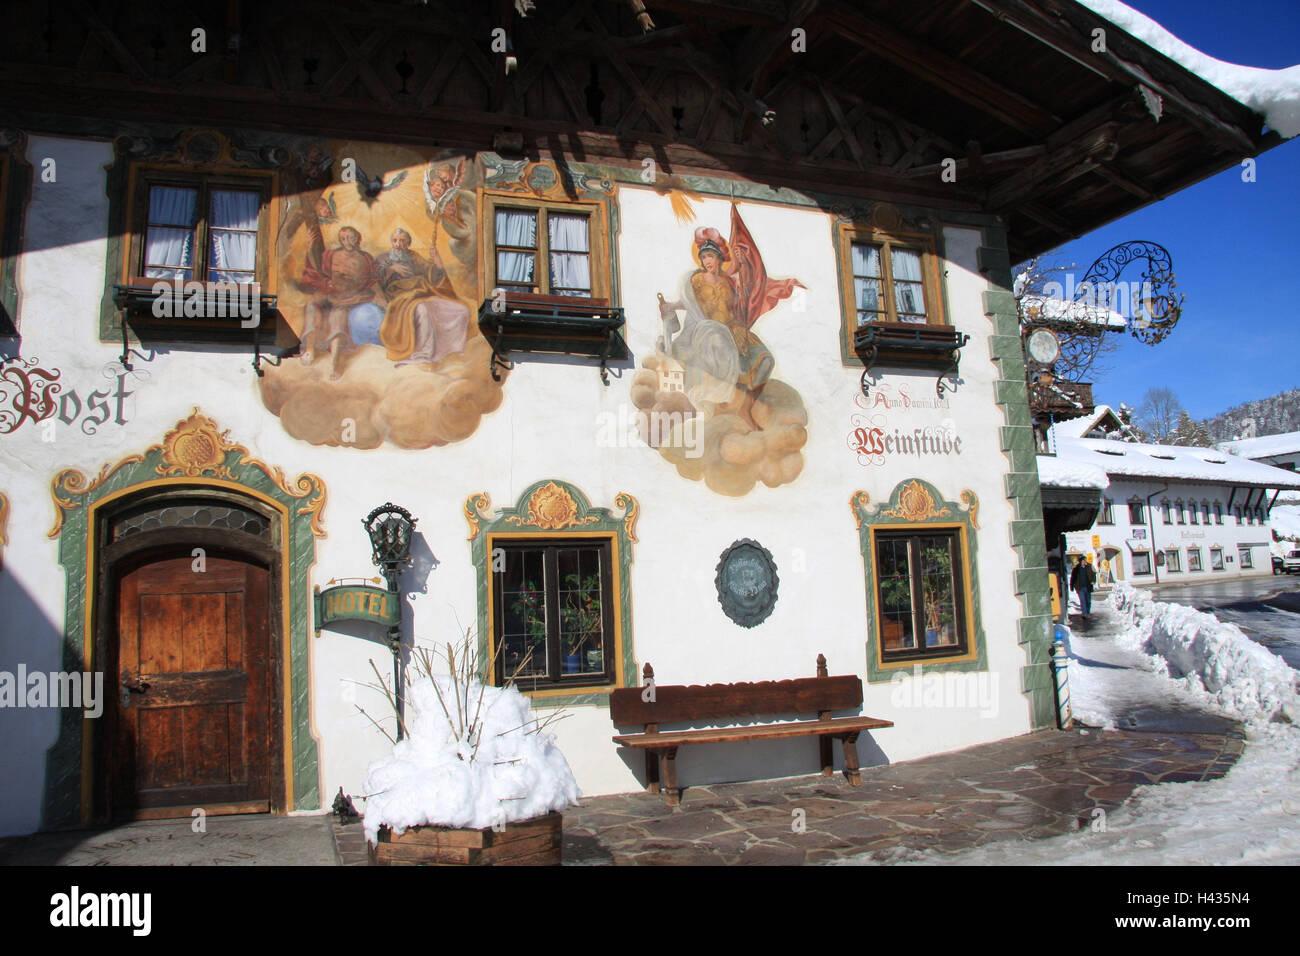 Germany, Bavaria, Werdenfels, embankment region, postal hotel, facade, Lüftlmalerei, detail, South Germany, - Stock Image